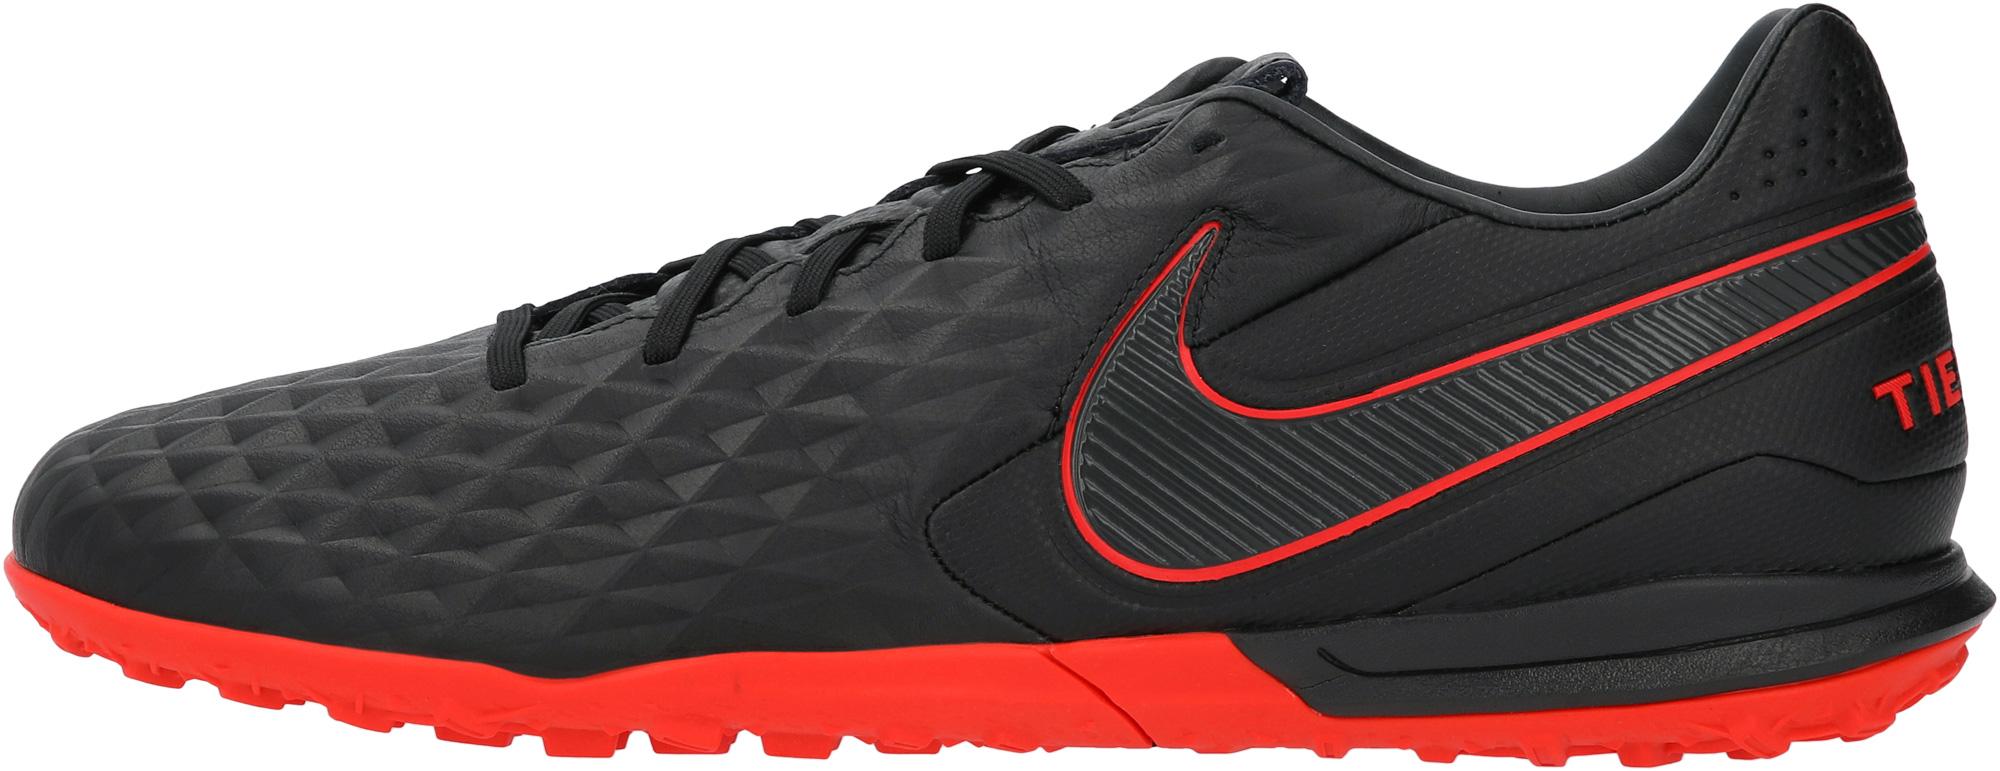 Бутсы мужские Nike Legend 8 Pro TF, размер 40 nike бутсы мужские nike legend 8 pro tf размер 40